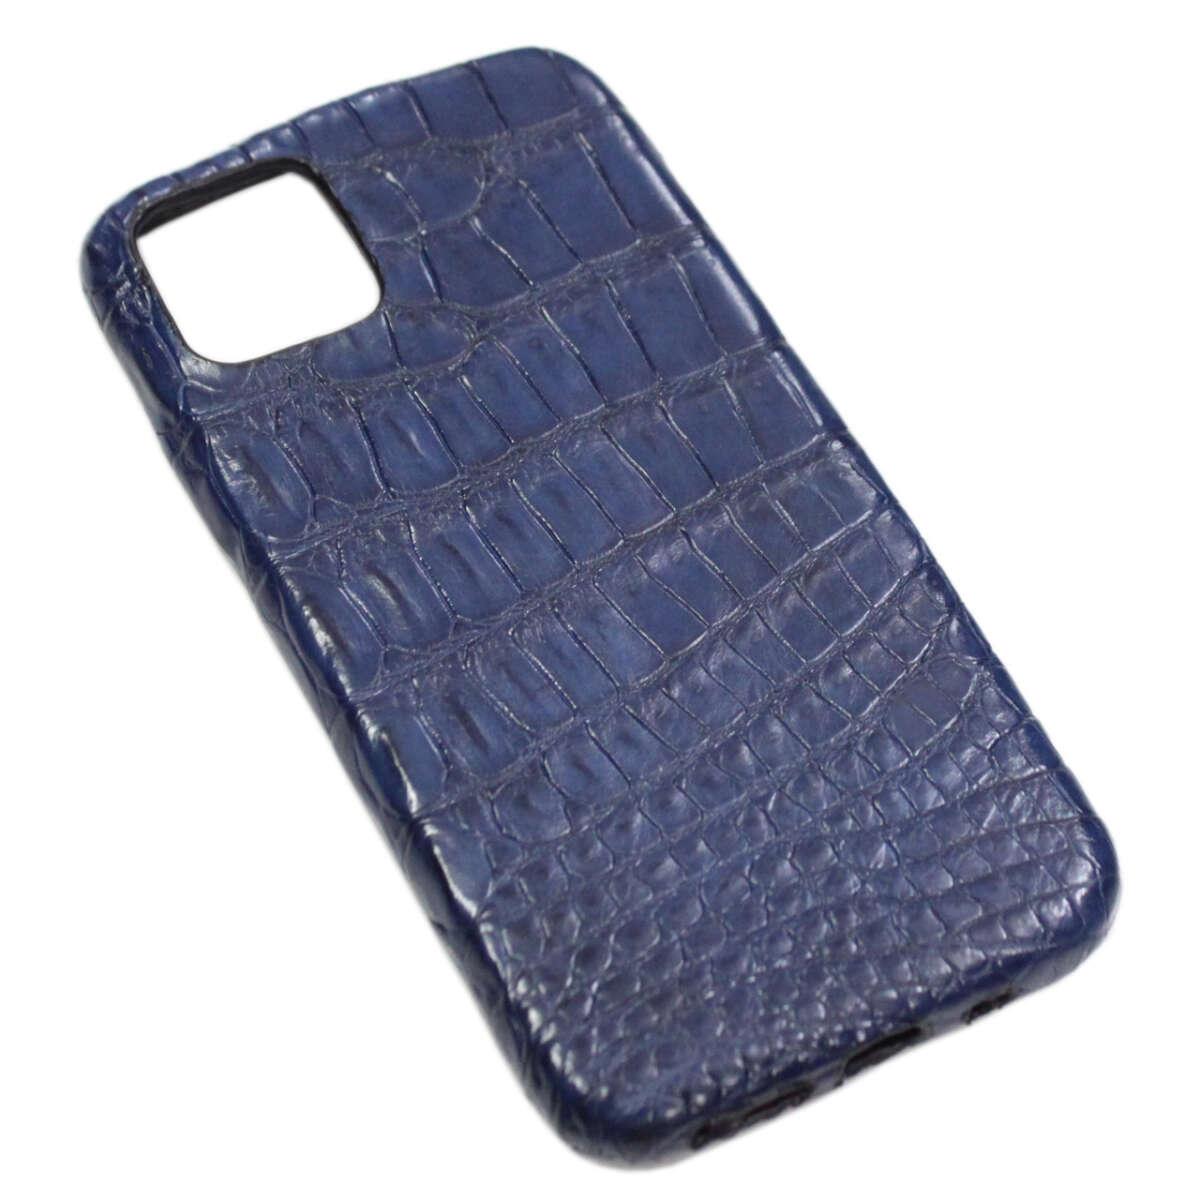 Ốp lưng iPhone 11 Pro da cá sấu S1068a